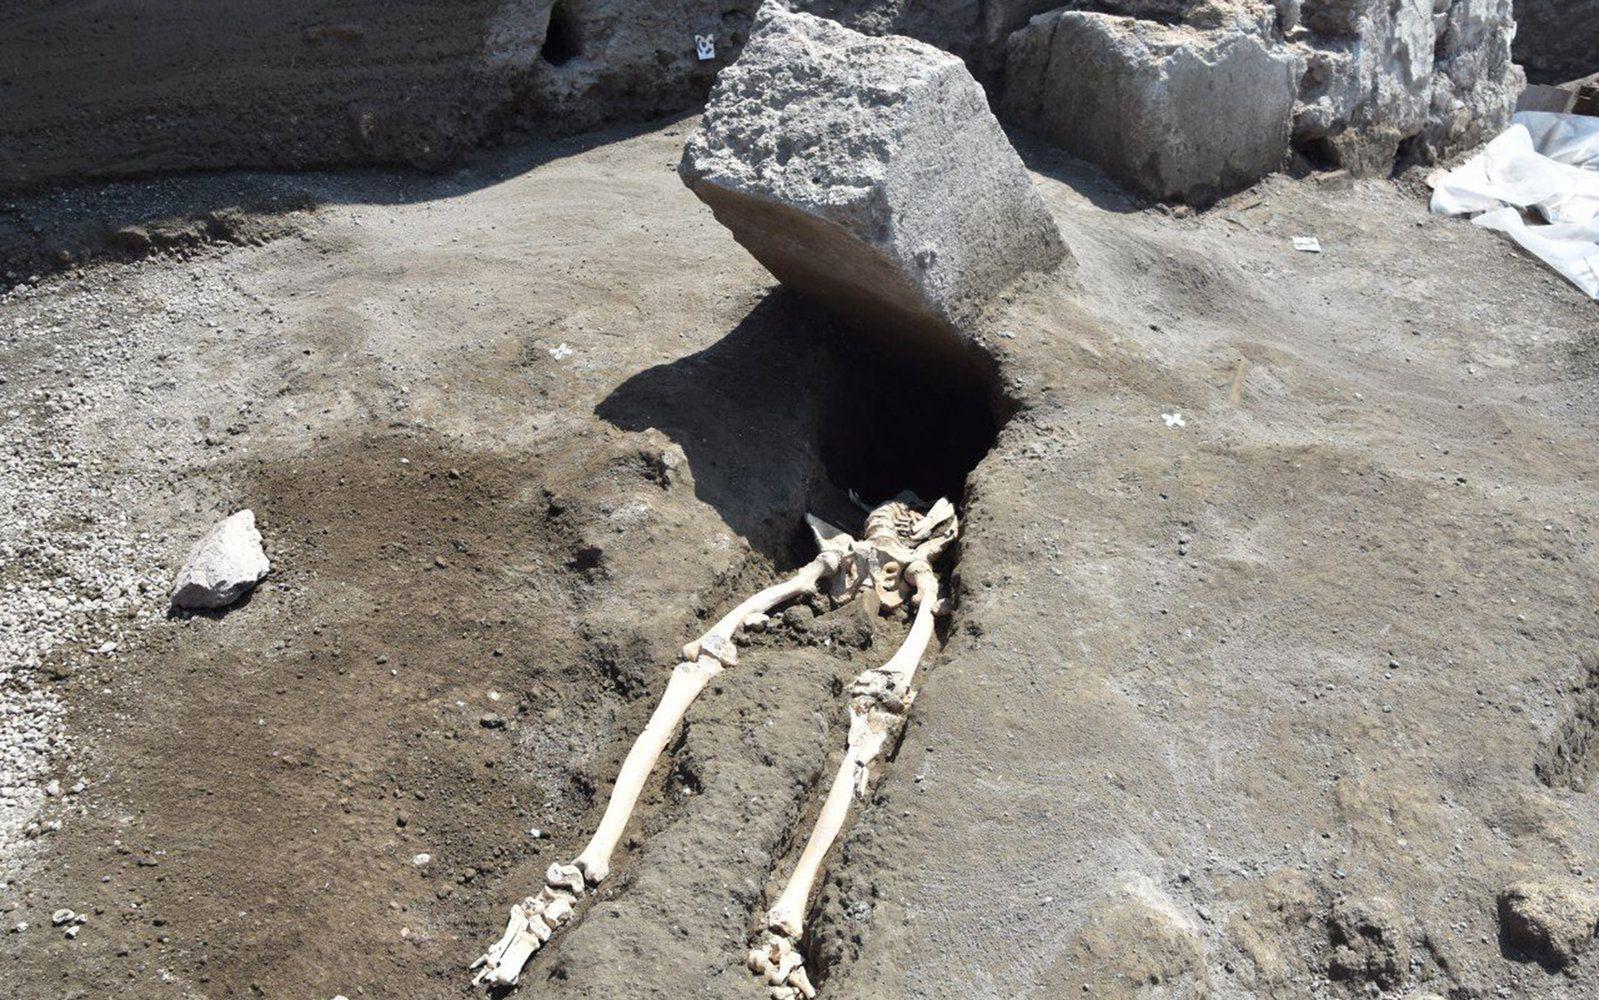 Pompeii Man Had A Really Really Bad Day 2 000 Years Ago Pompeii